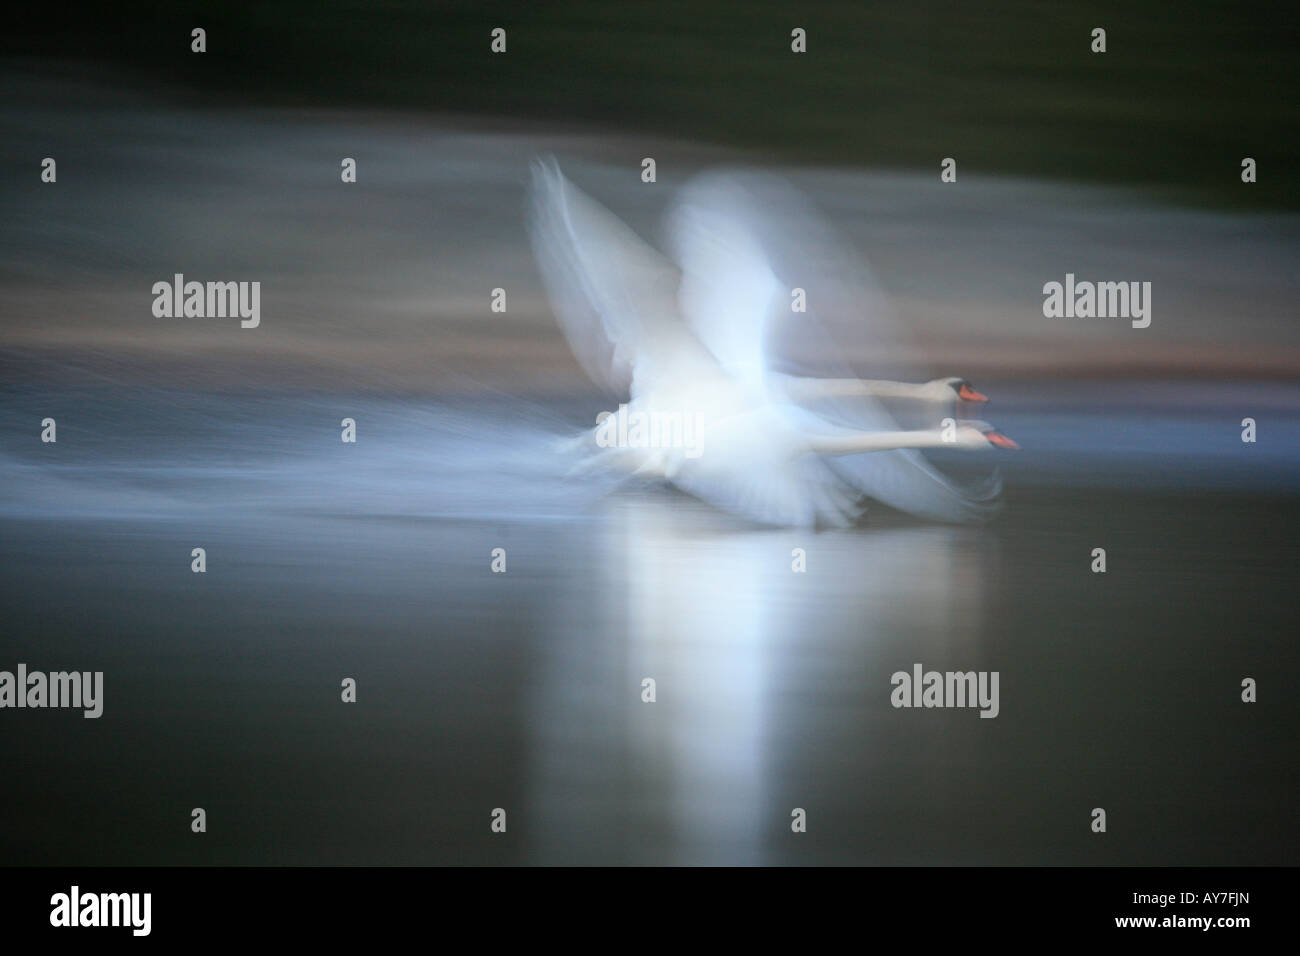 Mute Swan in dreamlike flight over the lake Vansjø, Østfold fylke, Norway. - Stock Image